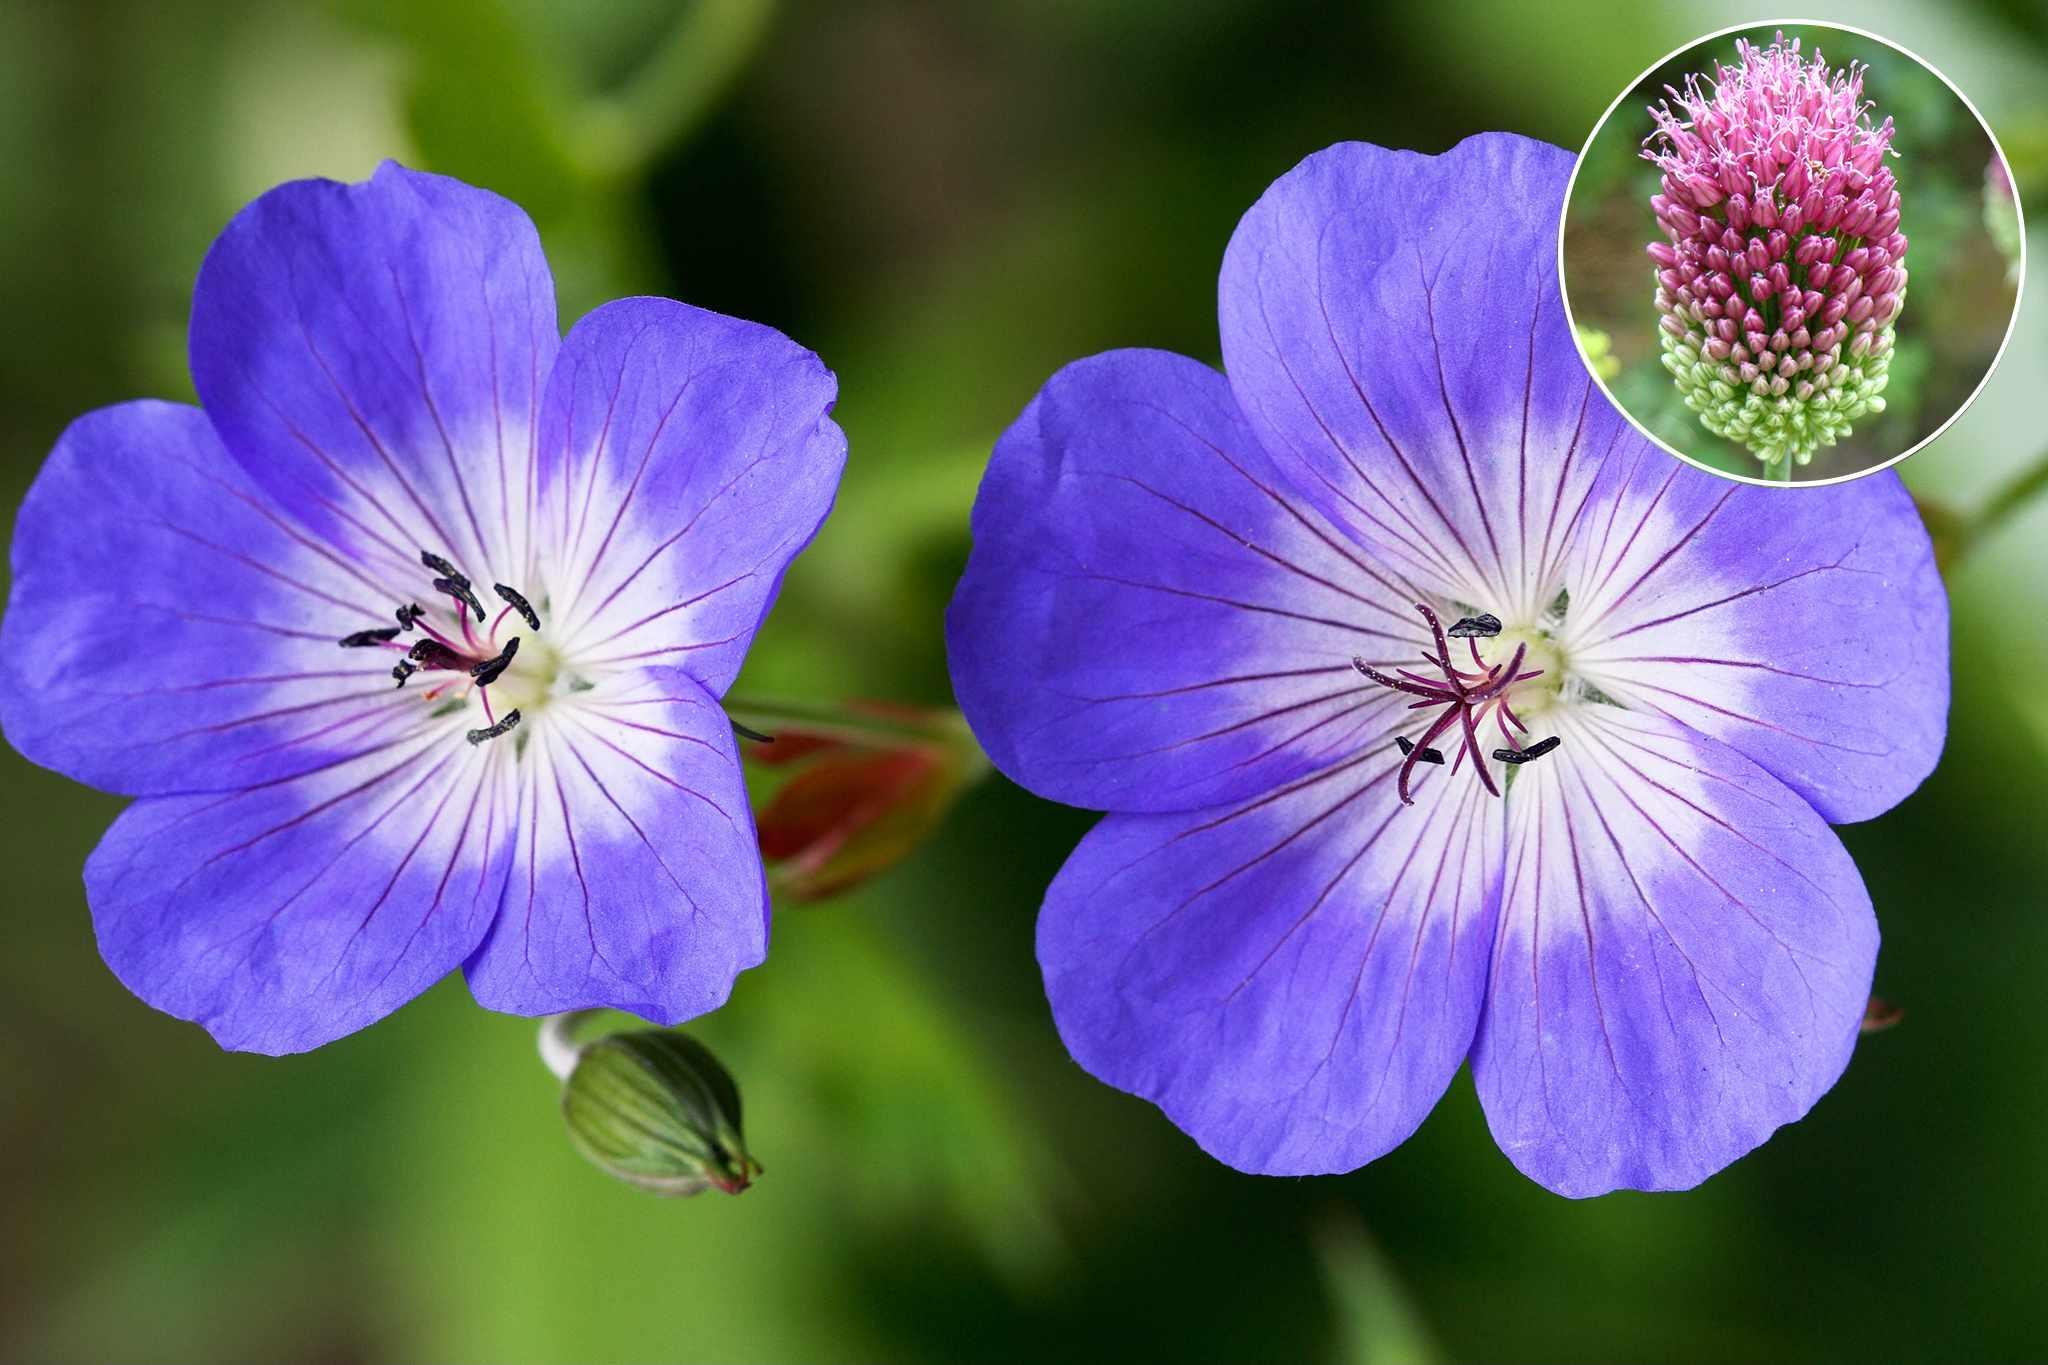 hayloft-hardy-geranium-rozanne-2048-1365